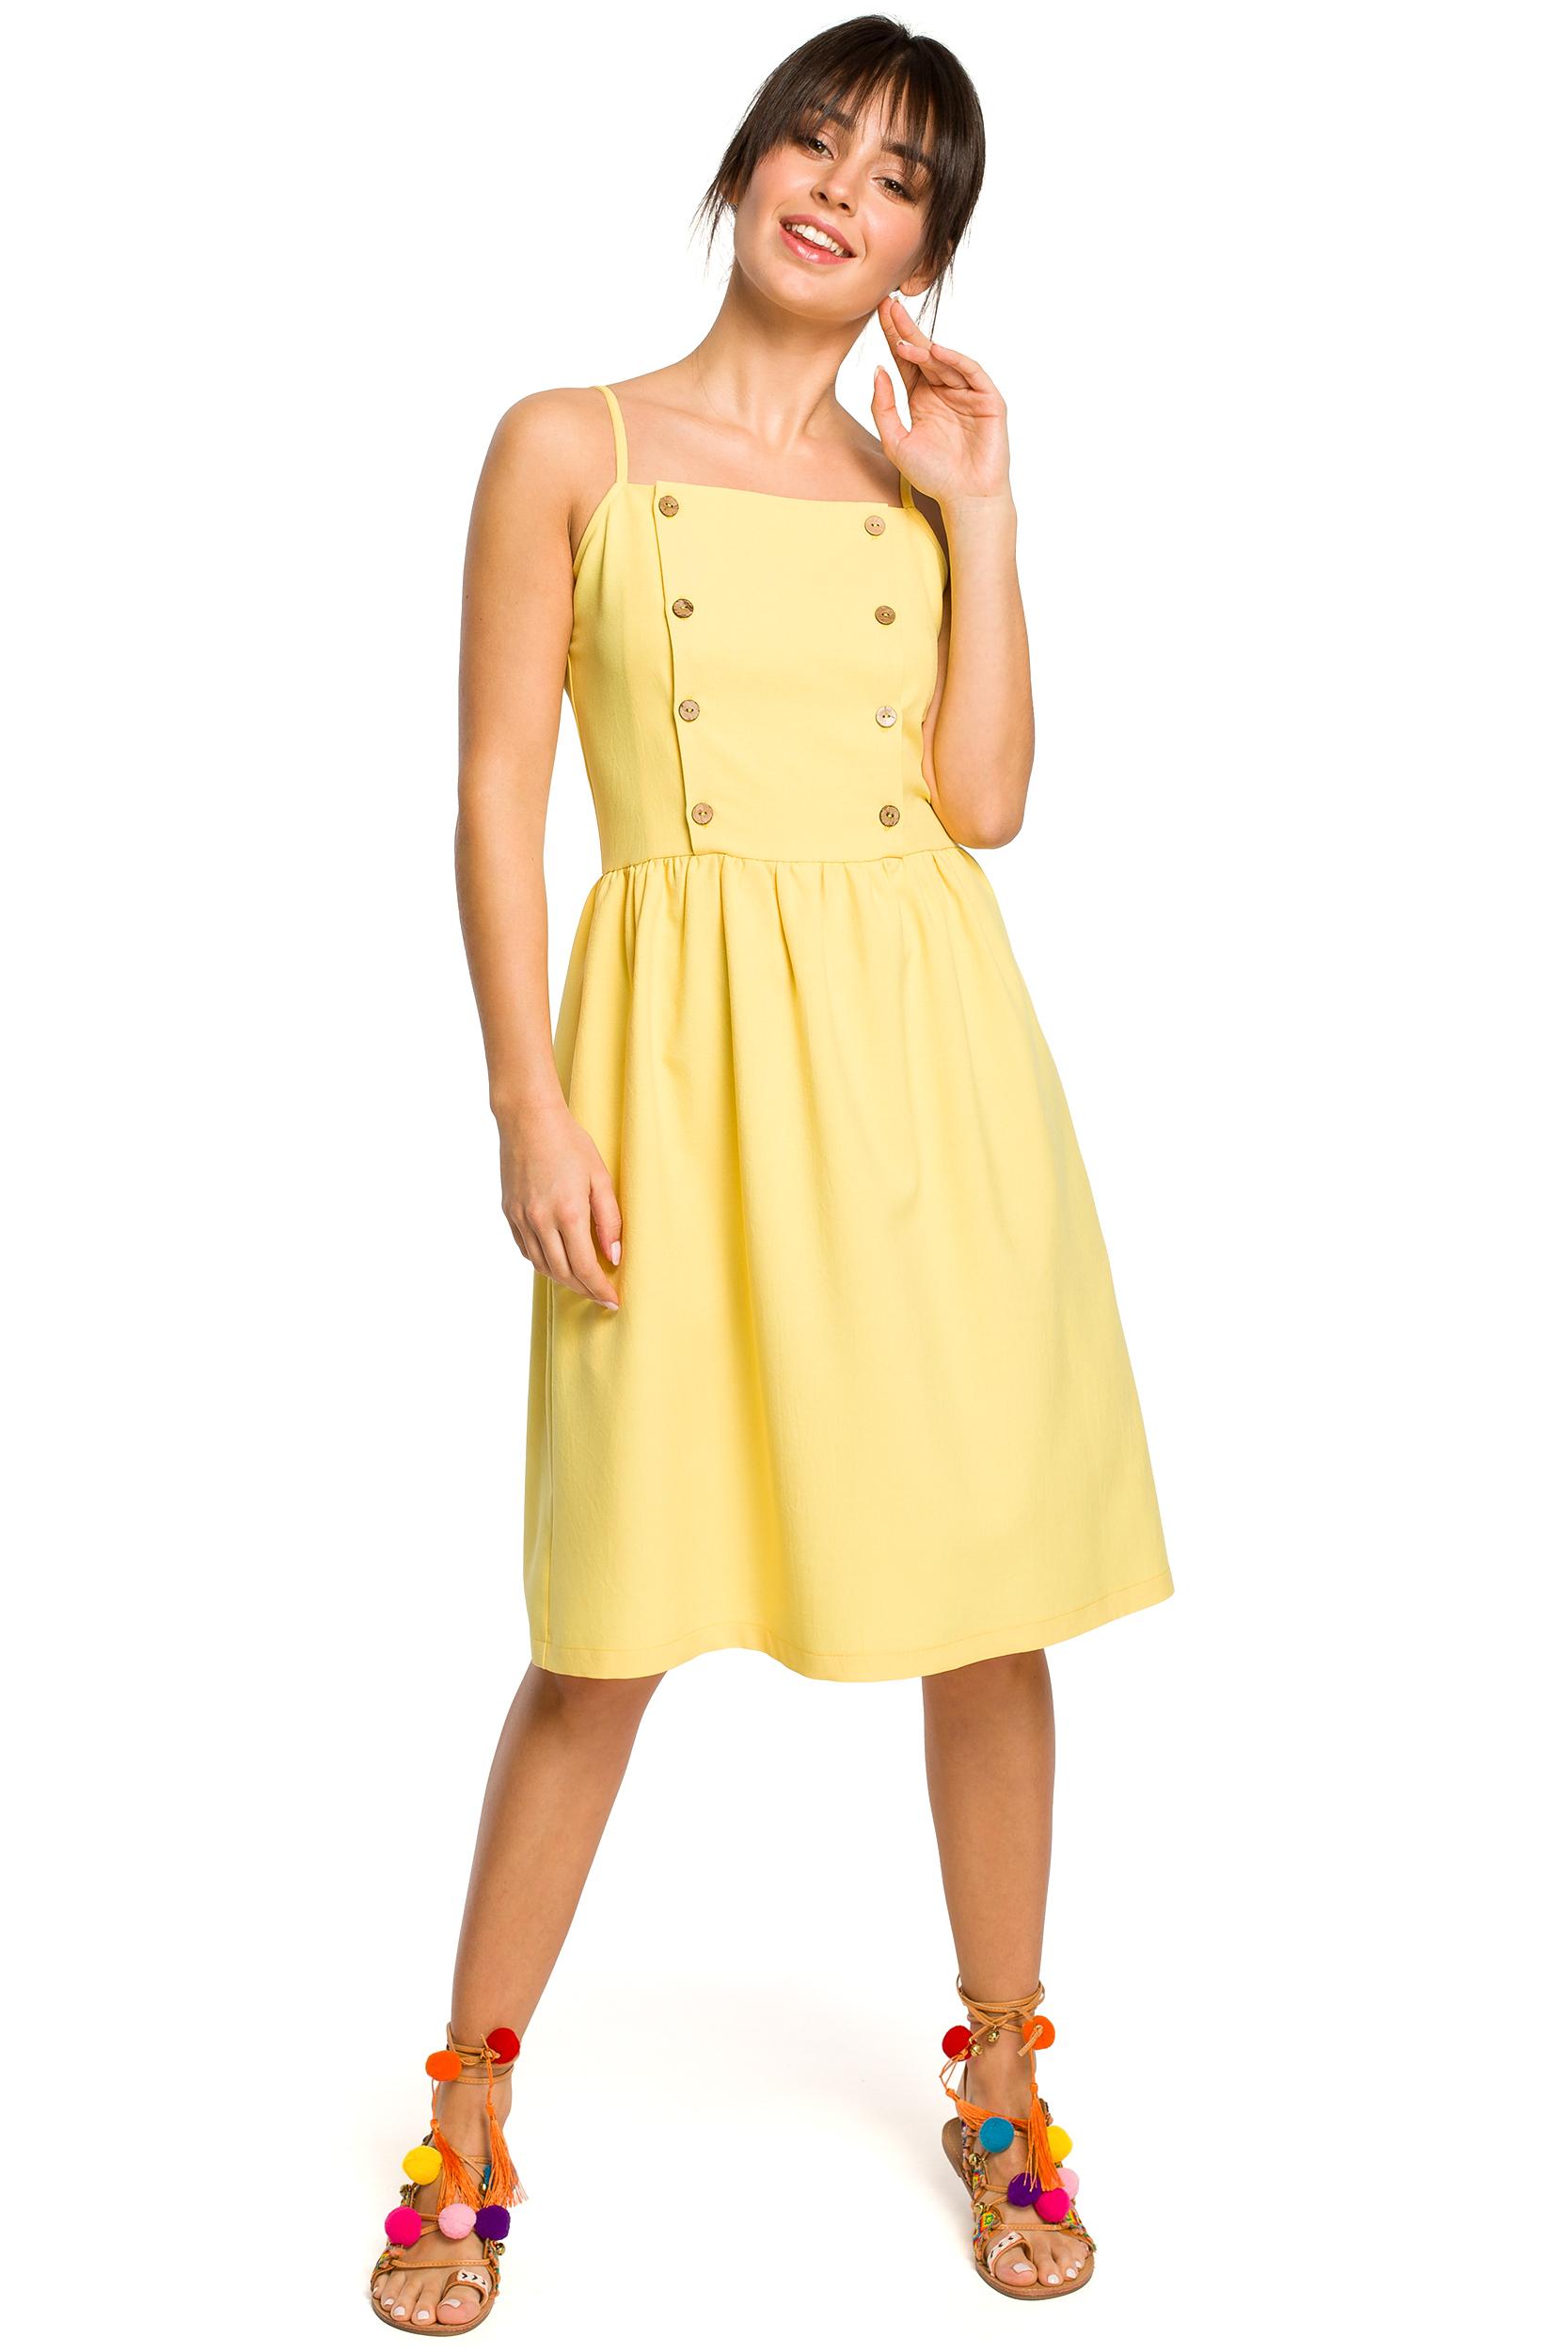 55481a921e Sukienka na ramiączkach za kolano żółta - tani kurier już od 5